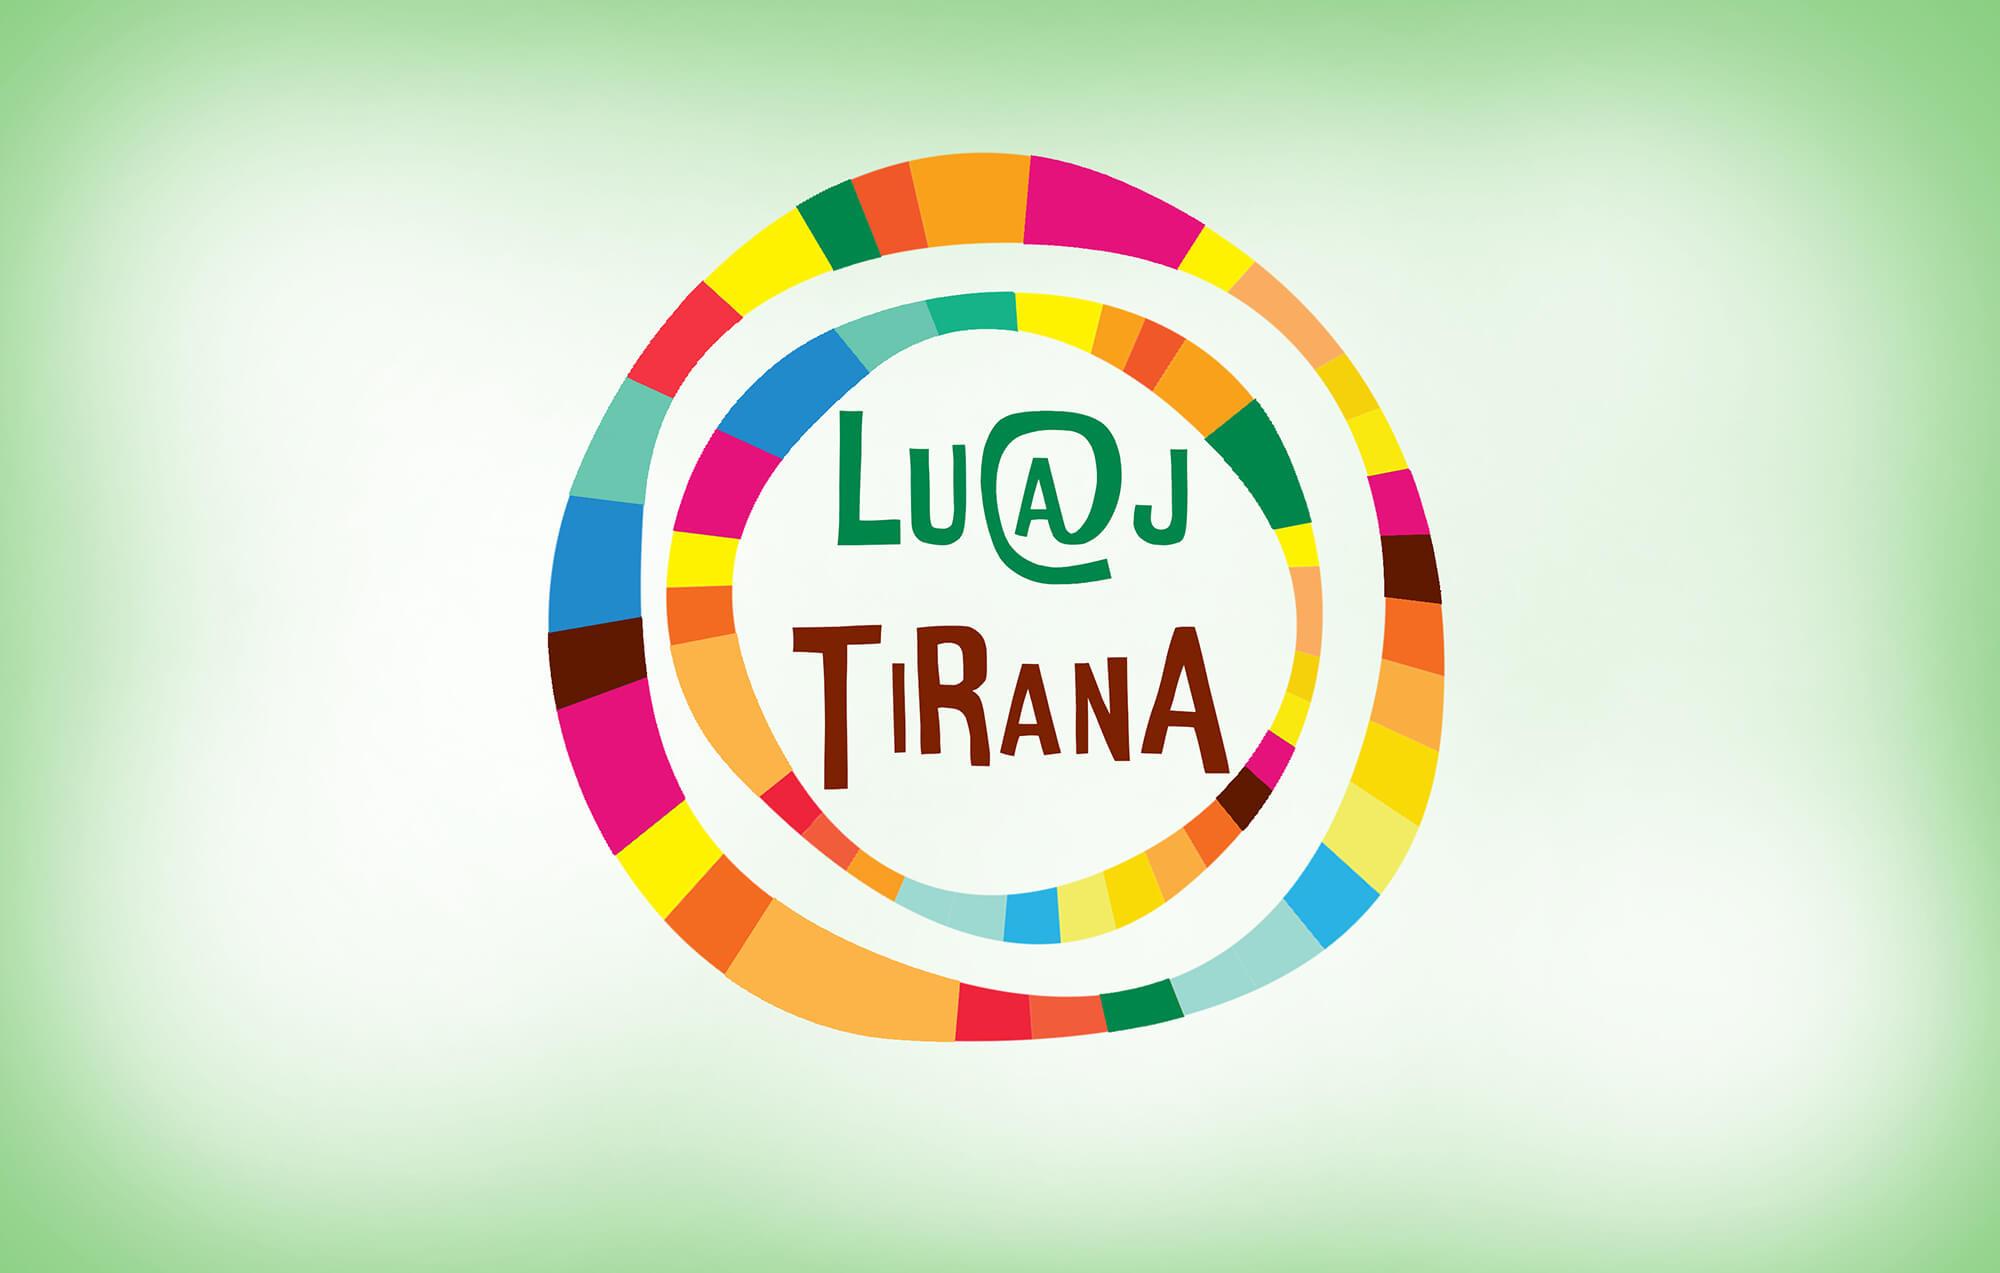 LUAJ_TIRANA copy